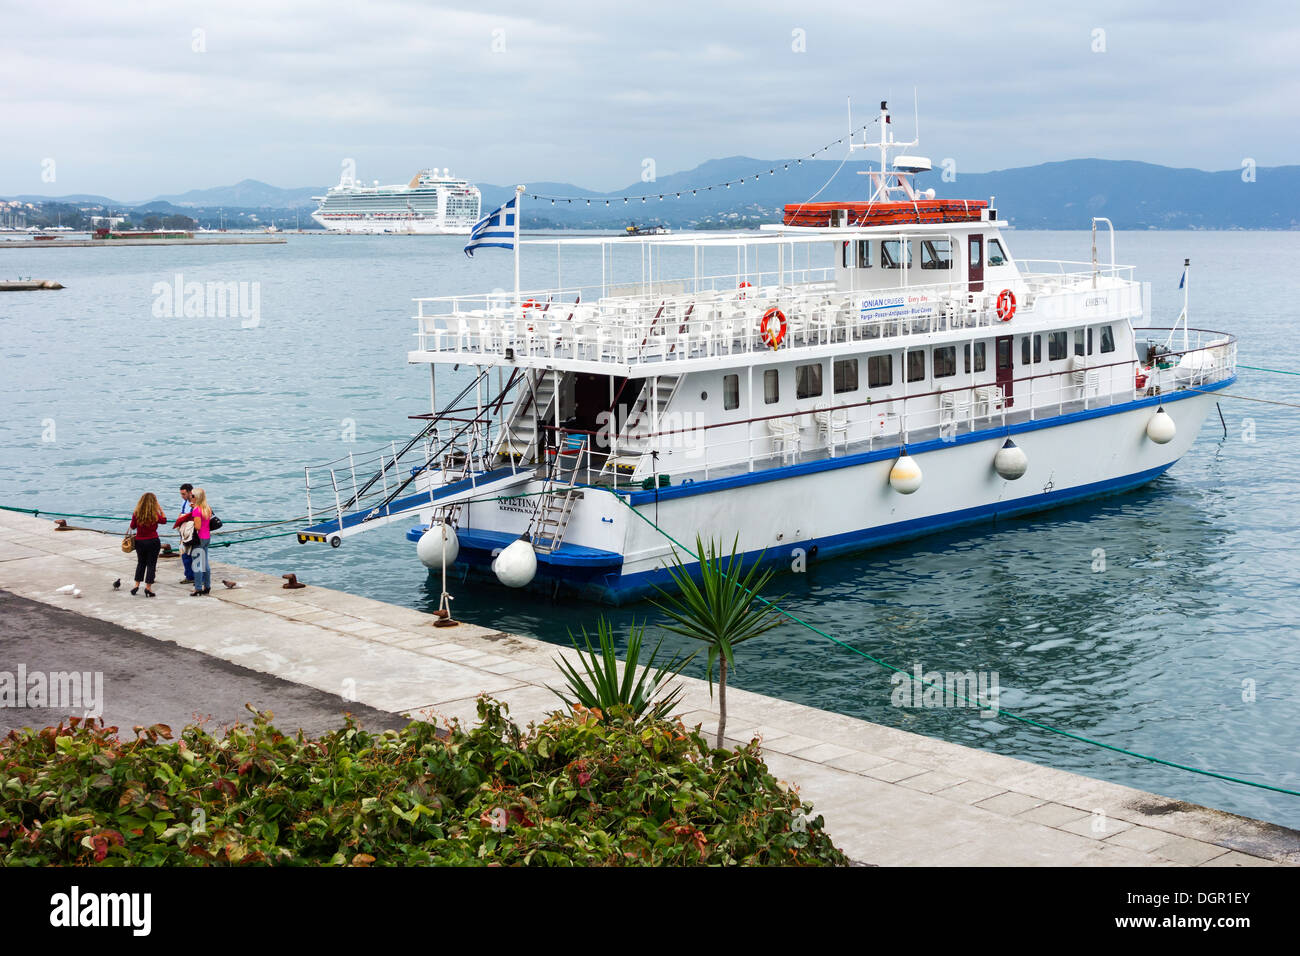 Boat trip, ferry boat tourism on water, Bay of Corfu -  Old Town, Corfu Island, Ionian Islands, Greek Islands, Greece, Europe. - Stock Image